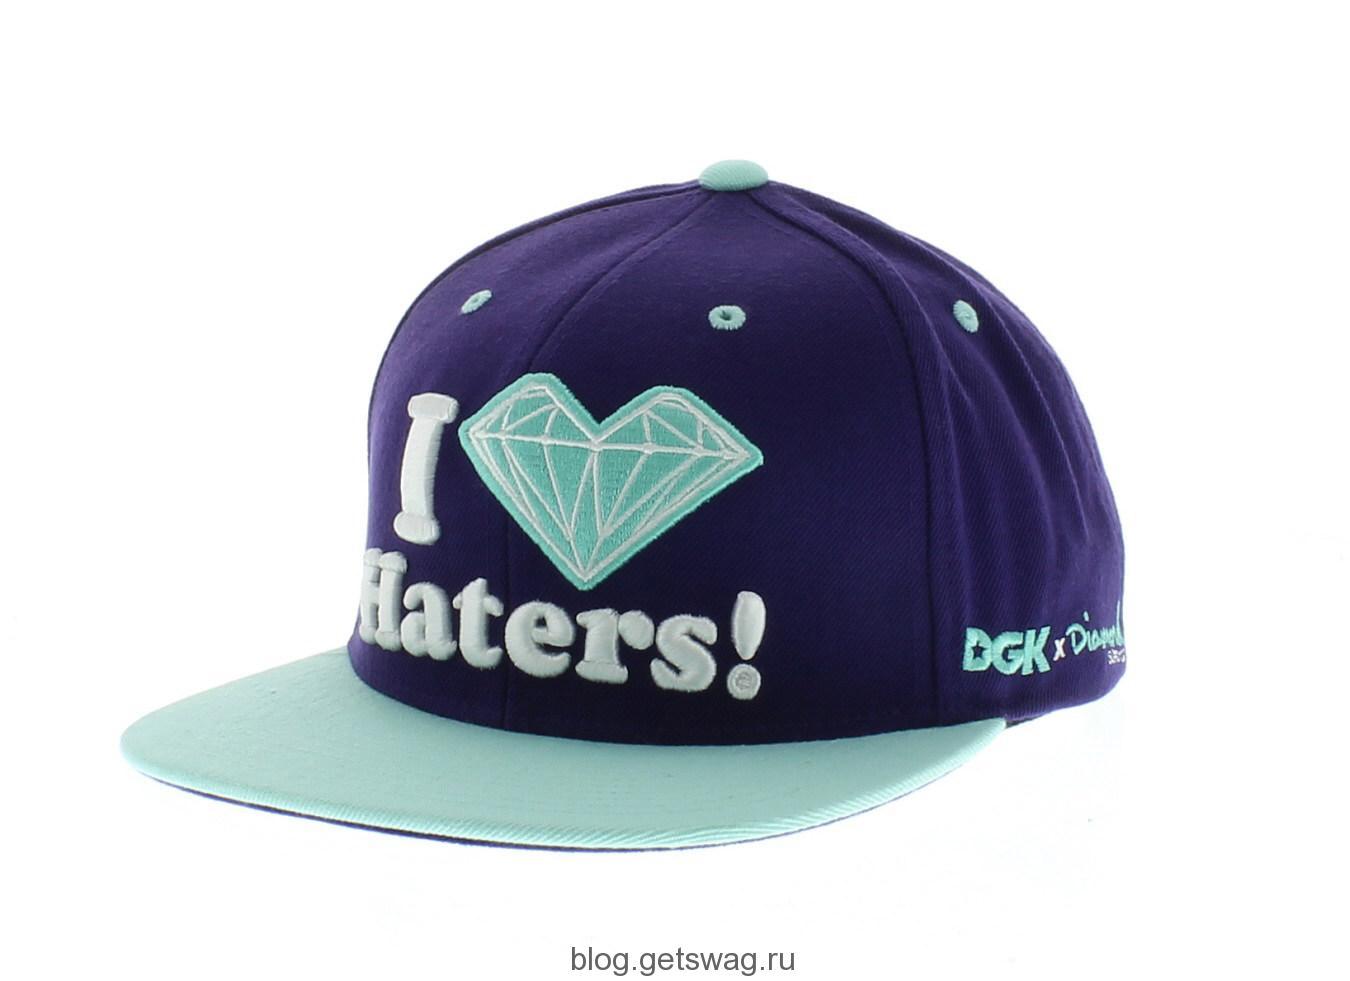 7-DGK-The-Diamond-Hater-Snapback-Purple-And-Sea-Glass-By-DGK-3 Что такое снепбек (snapback)